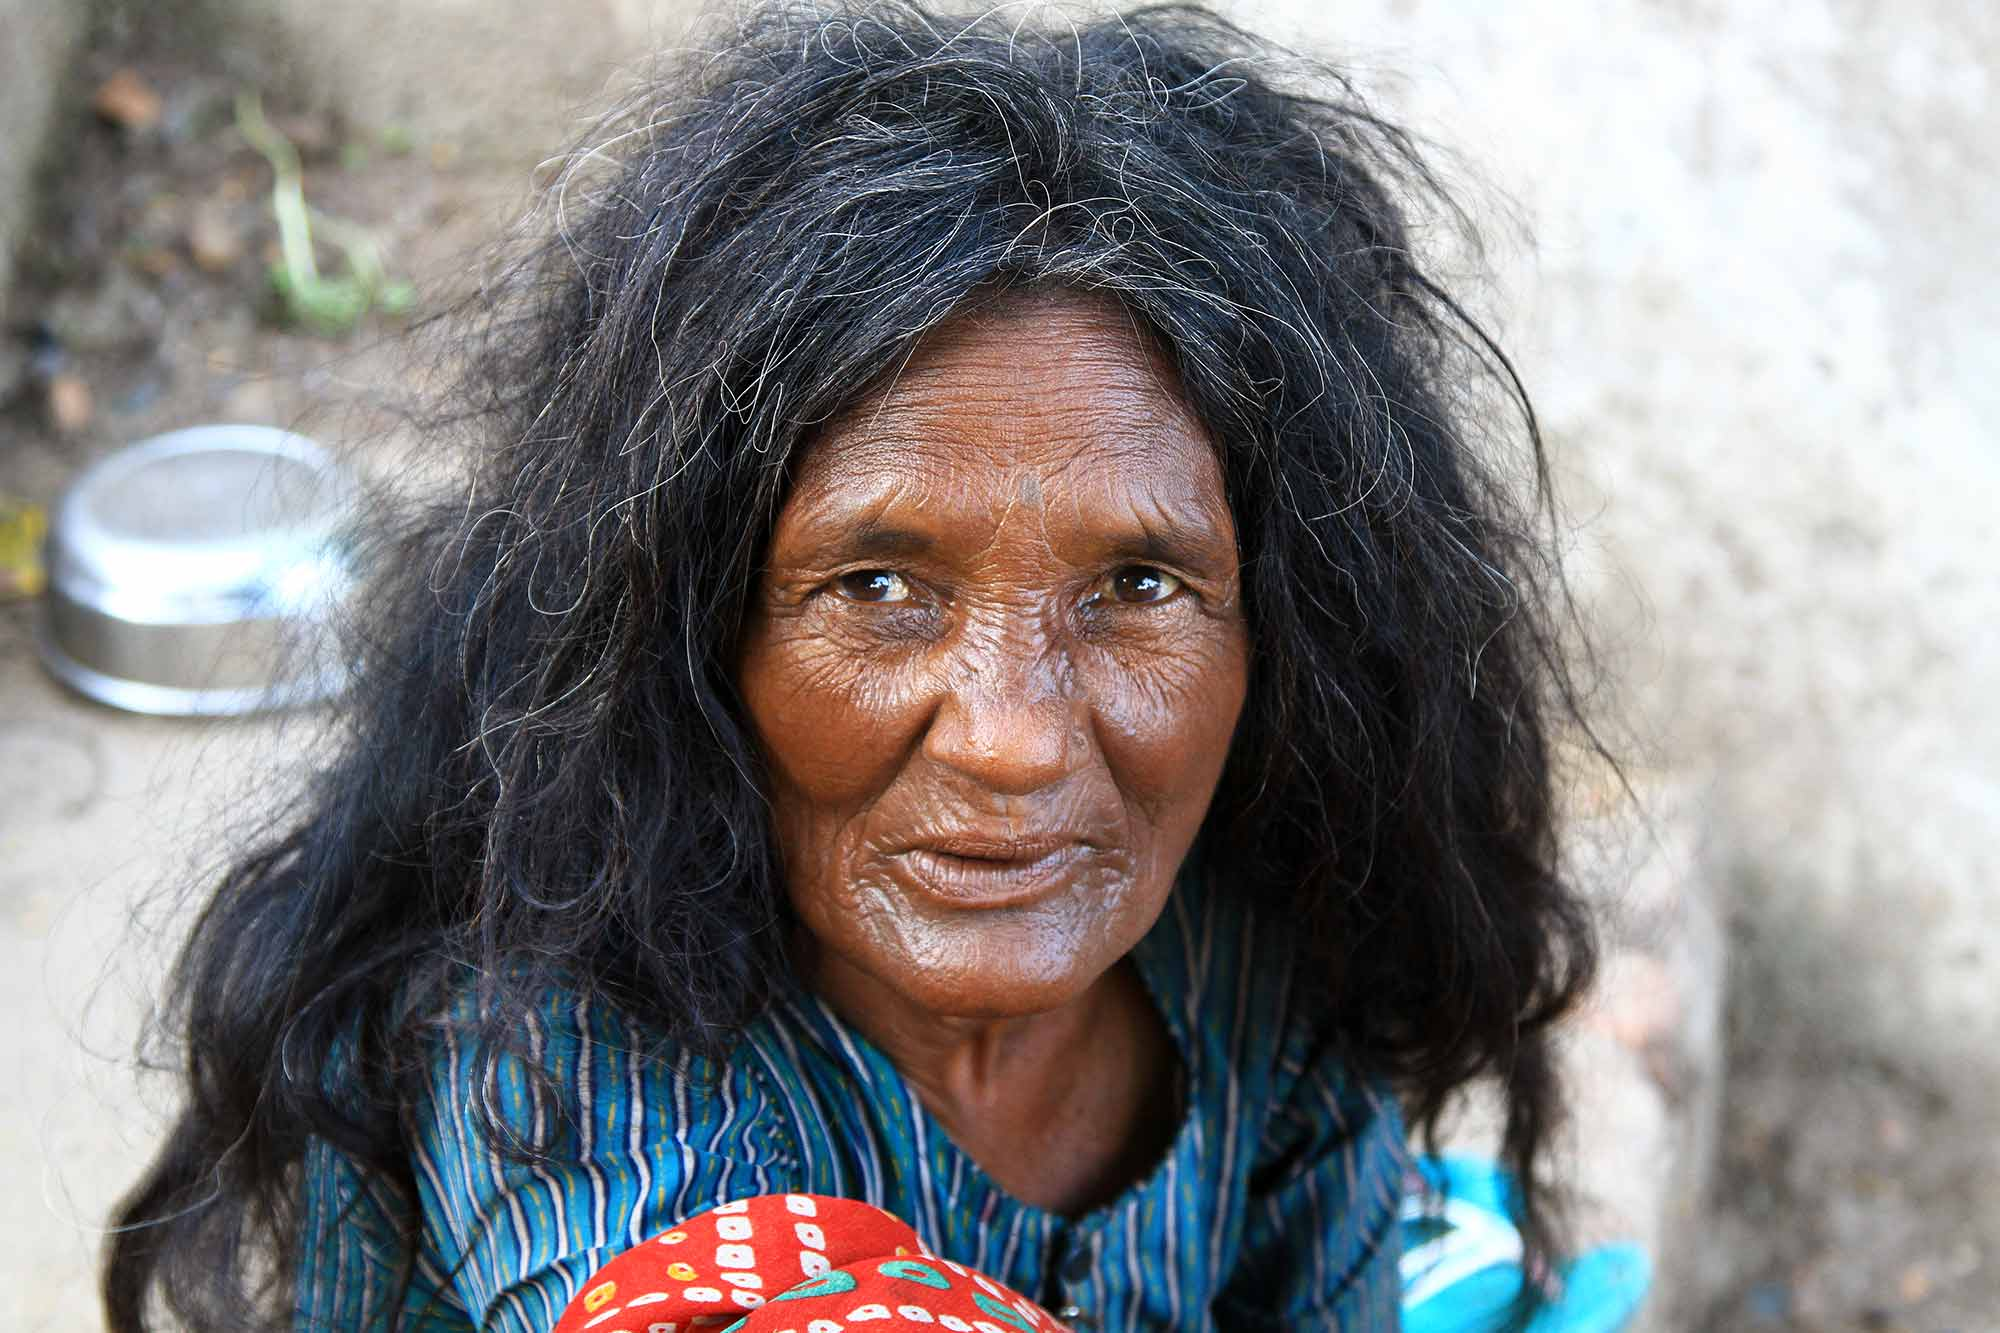 portrait-homeless-woman-in-varanasi-india